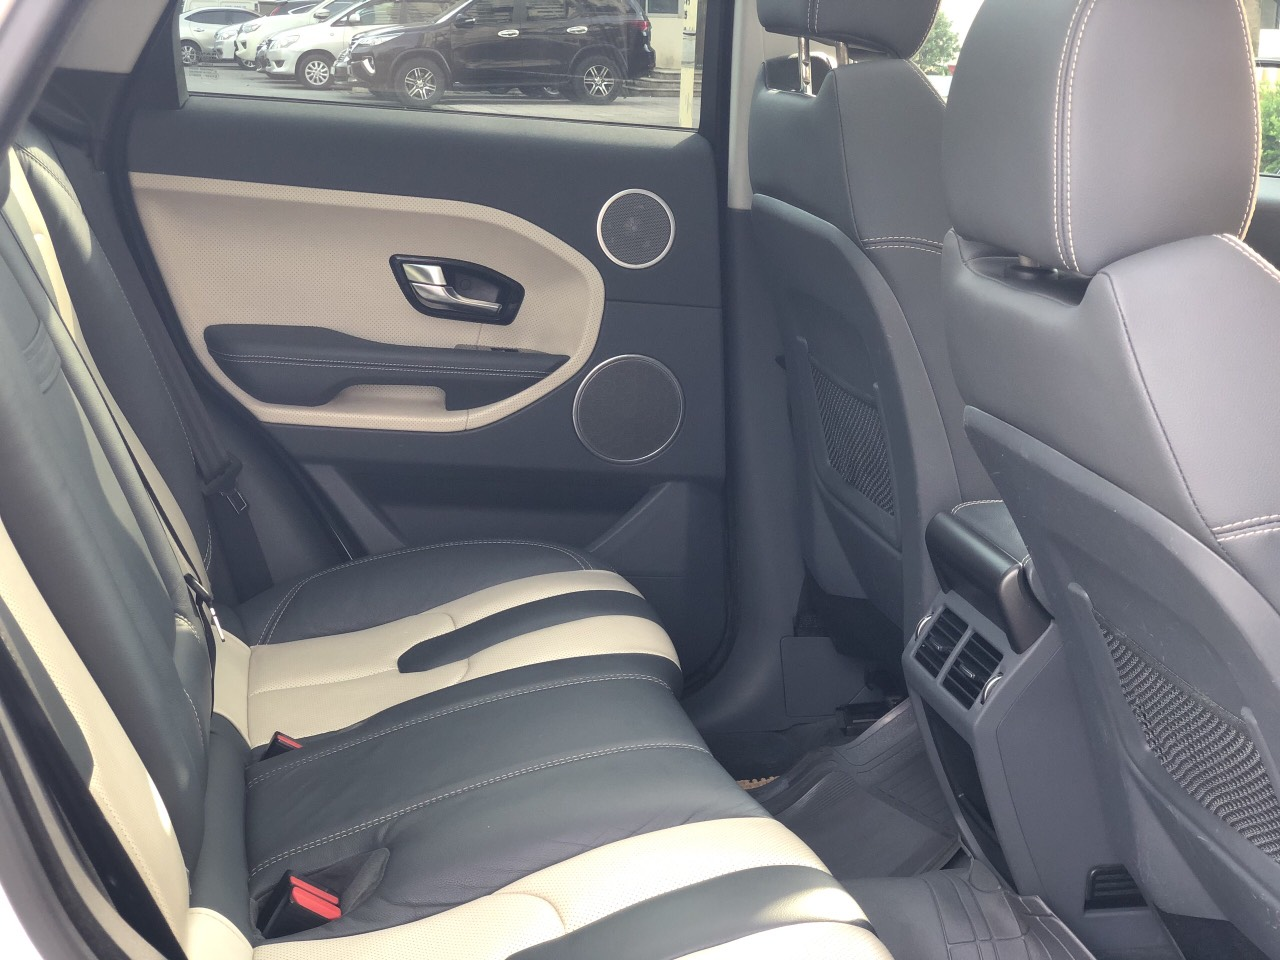 Range Rover Evoque 2013